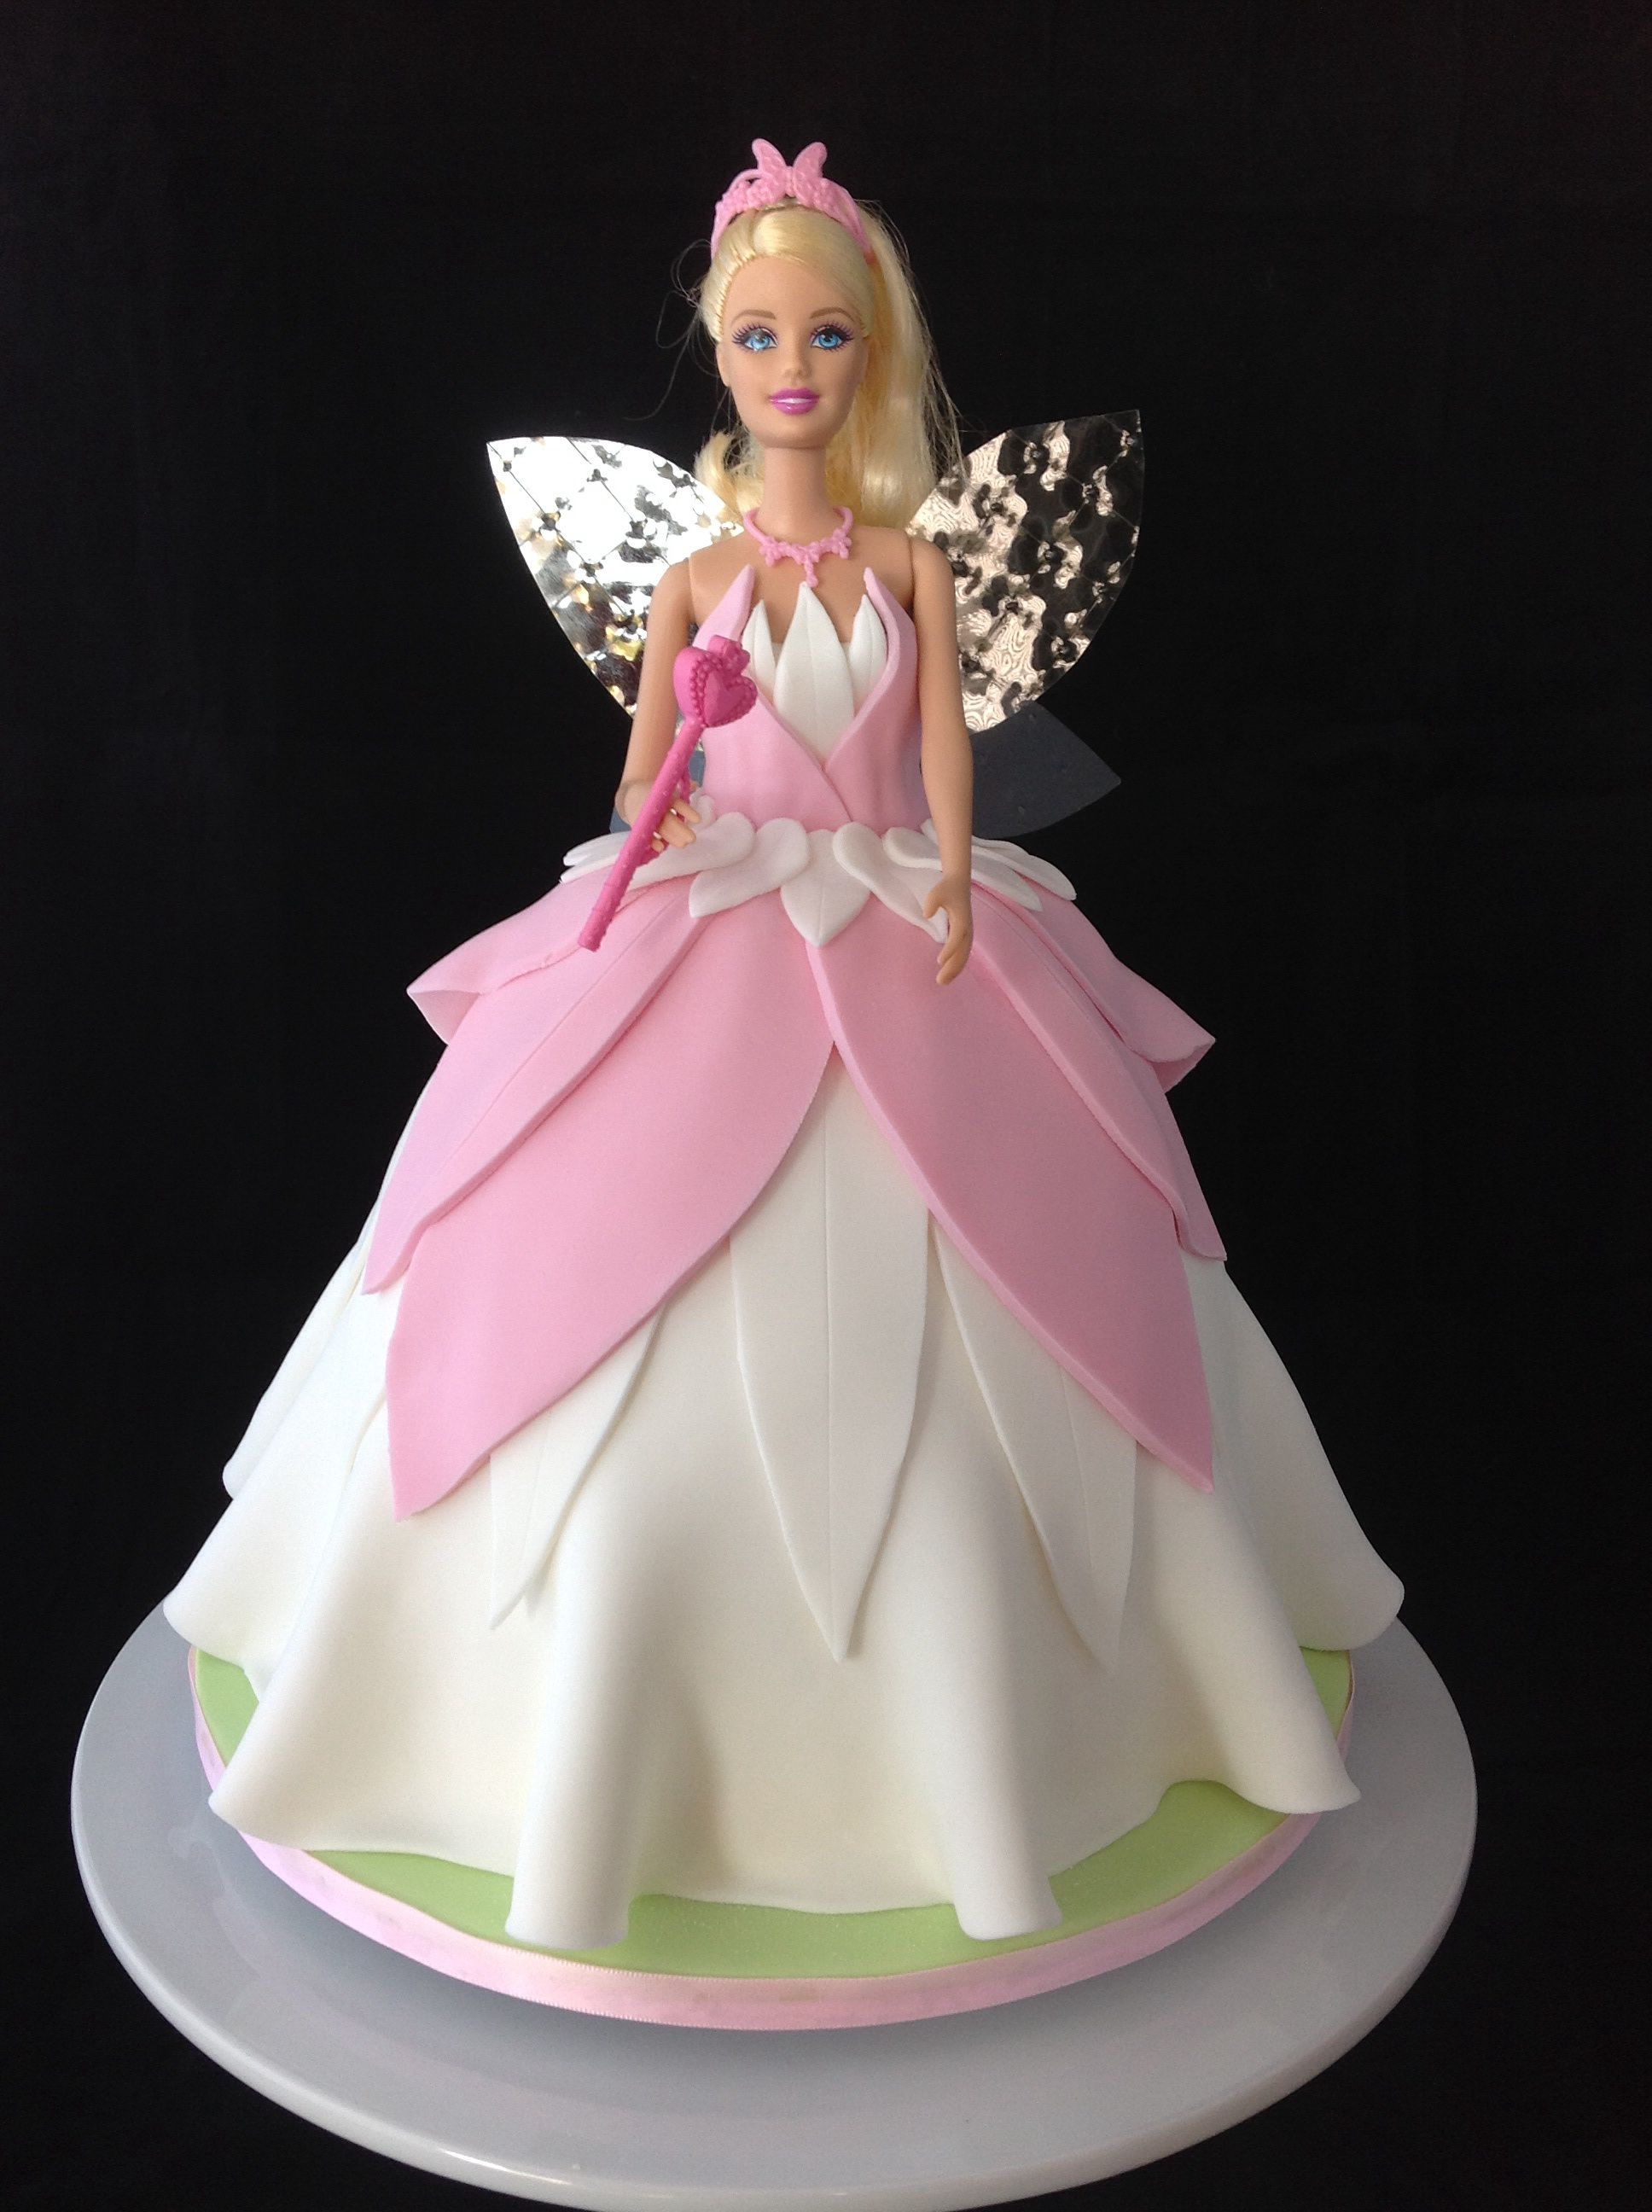 Fairy Barbie Cake With Gelatine Leaf Wings